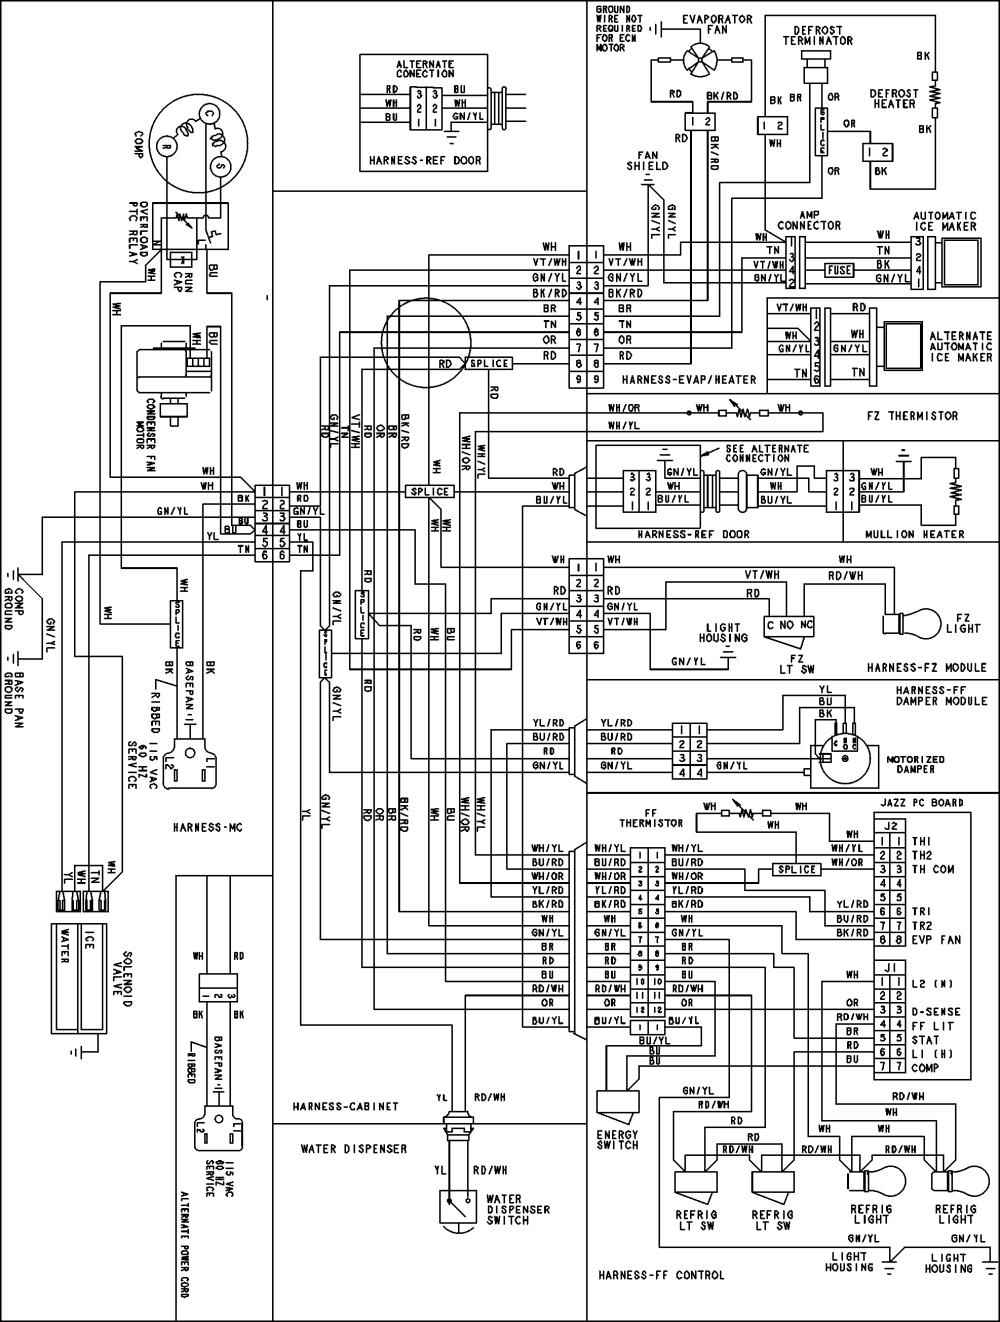 medium resolution of sears gas furnace wiring diagram schema wiring diagrams gas furnace relay wiring diagram sears gas furnace wiring diagram